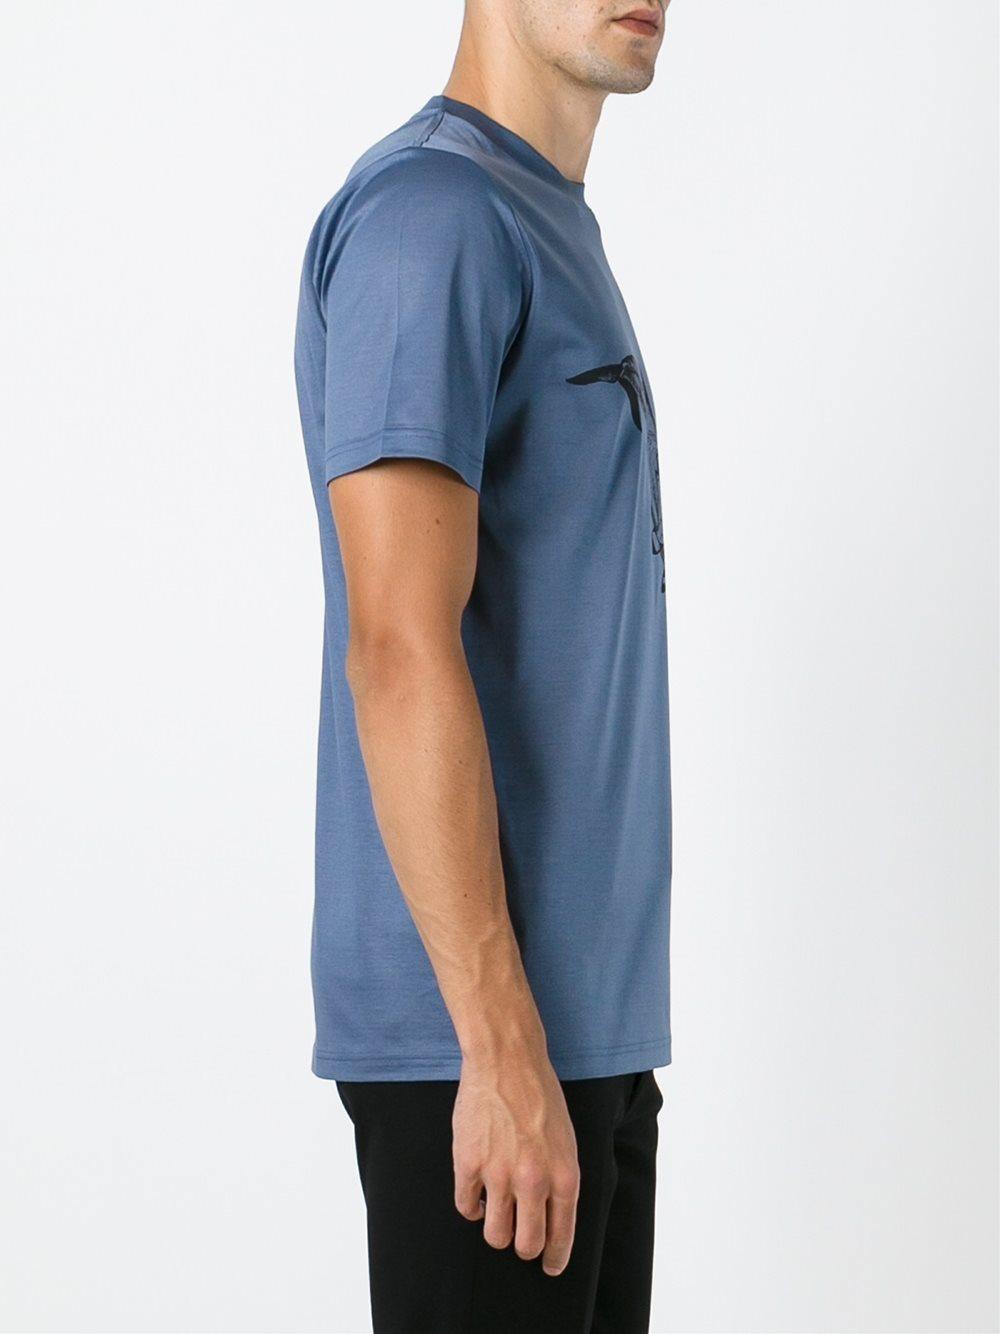 Lanvin Whale Print T Shirt In Blue For Men Lyst